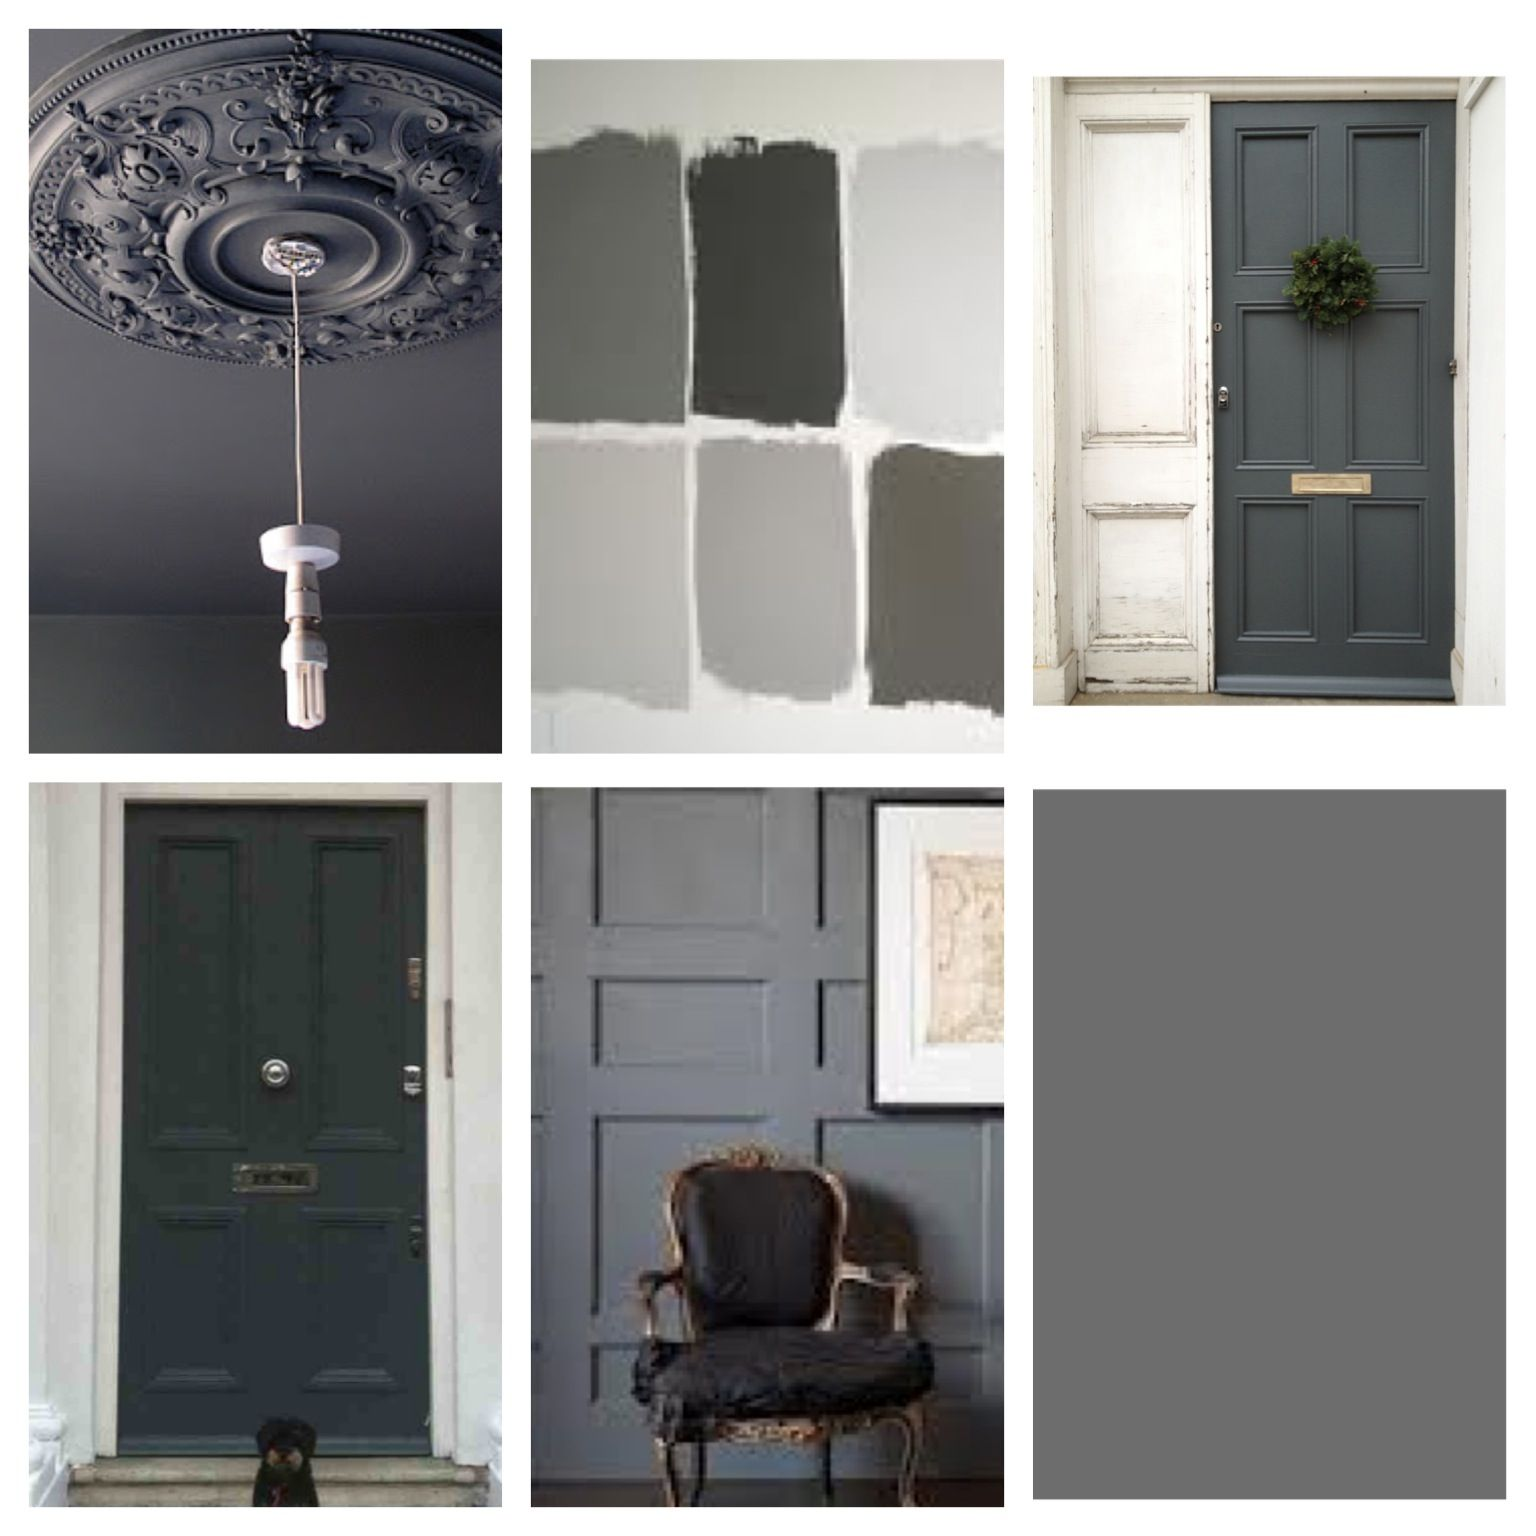 Farrow and ball edwardian colours google search the - Farrow and ball exterior masonry paint ideas ...